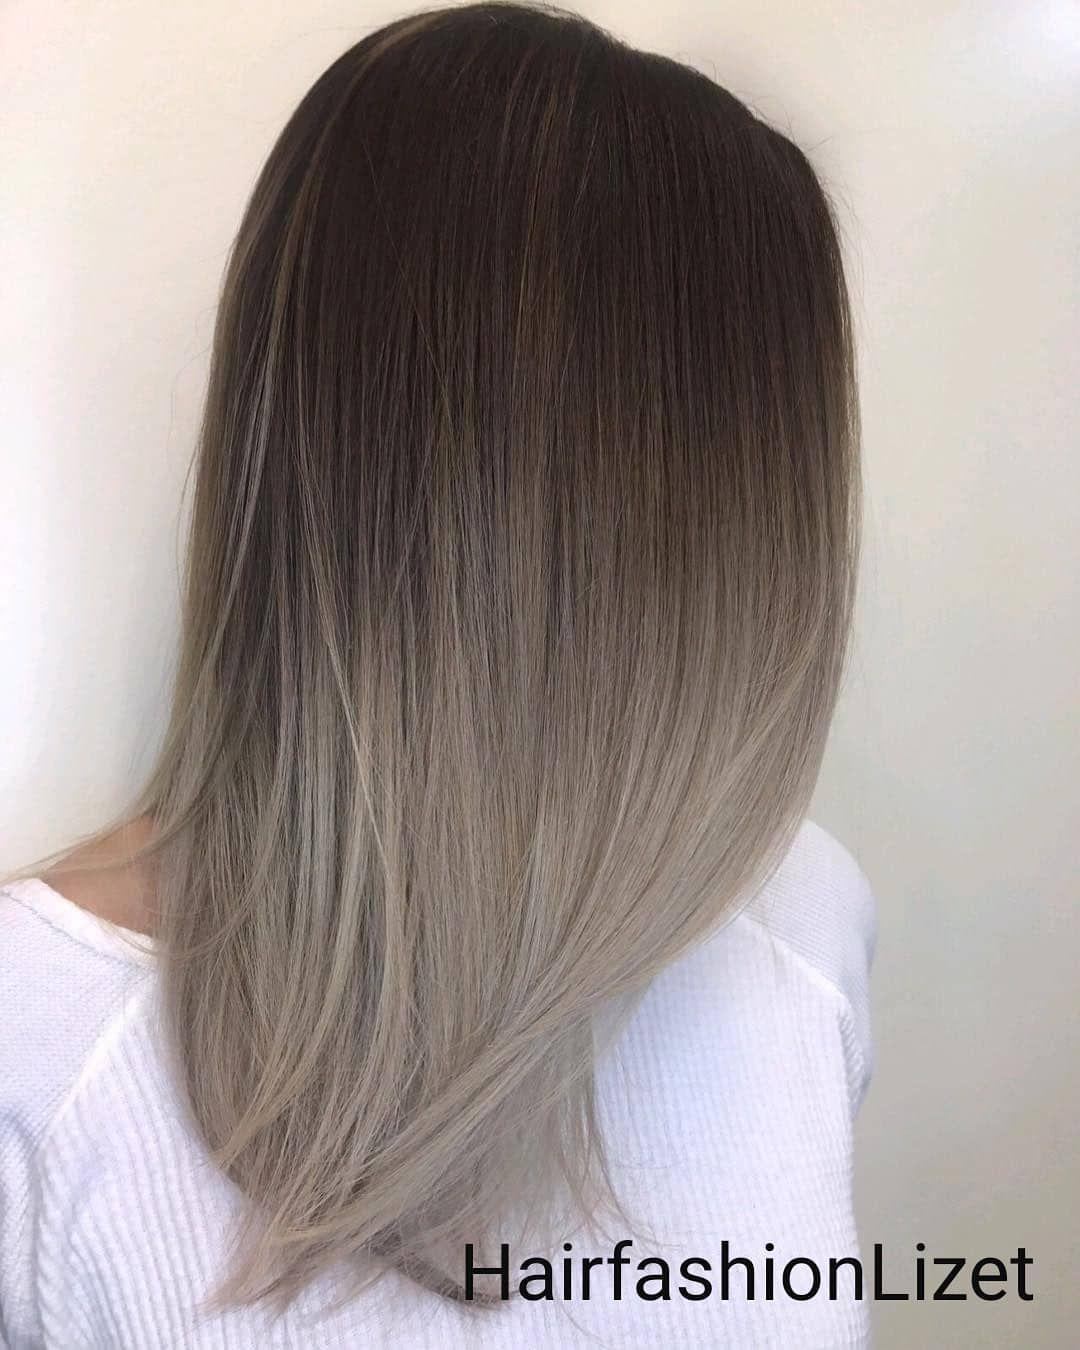 Hair hairstyle instahair hairstyles haircolour haircolor